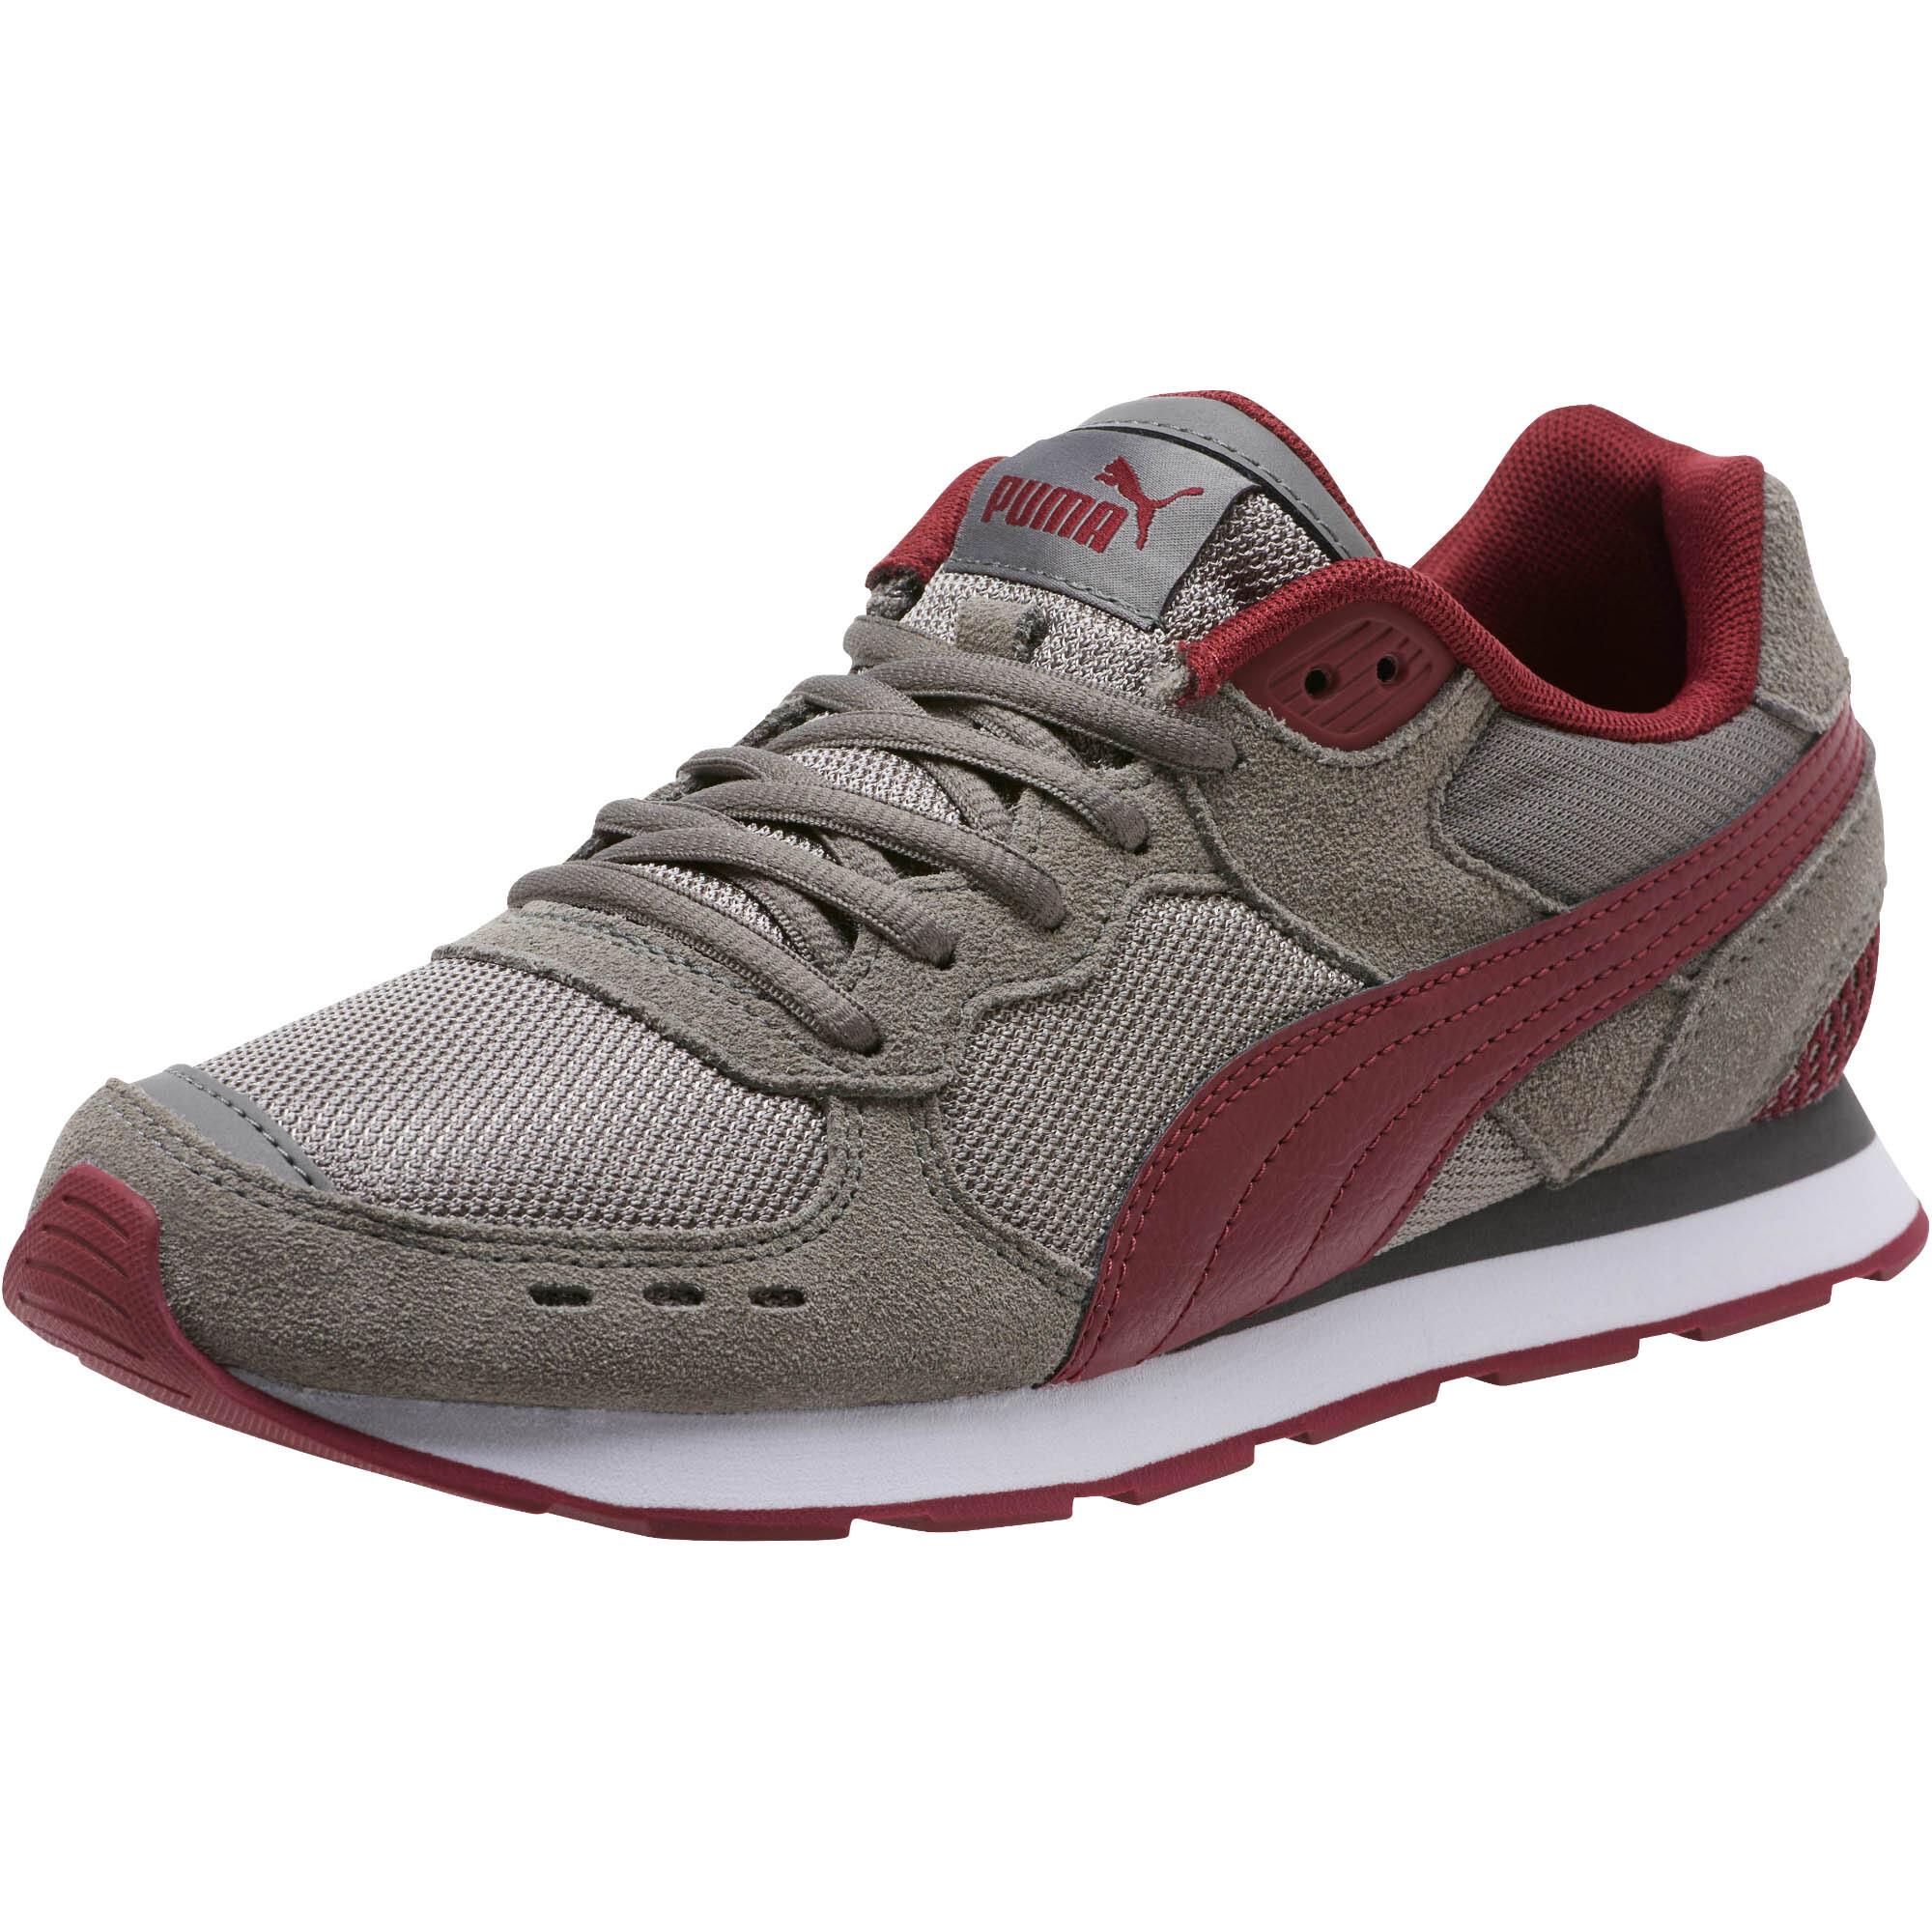 PUMA-Vista-Women-s-Sneakers-Women-Shoe-Basics thumbnail 20